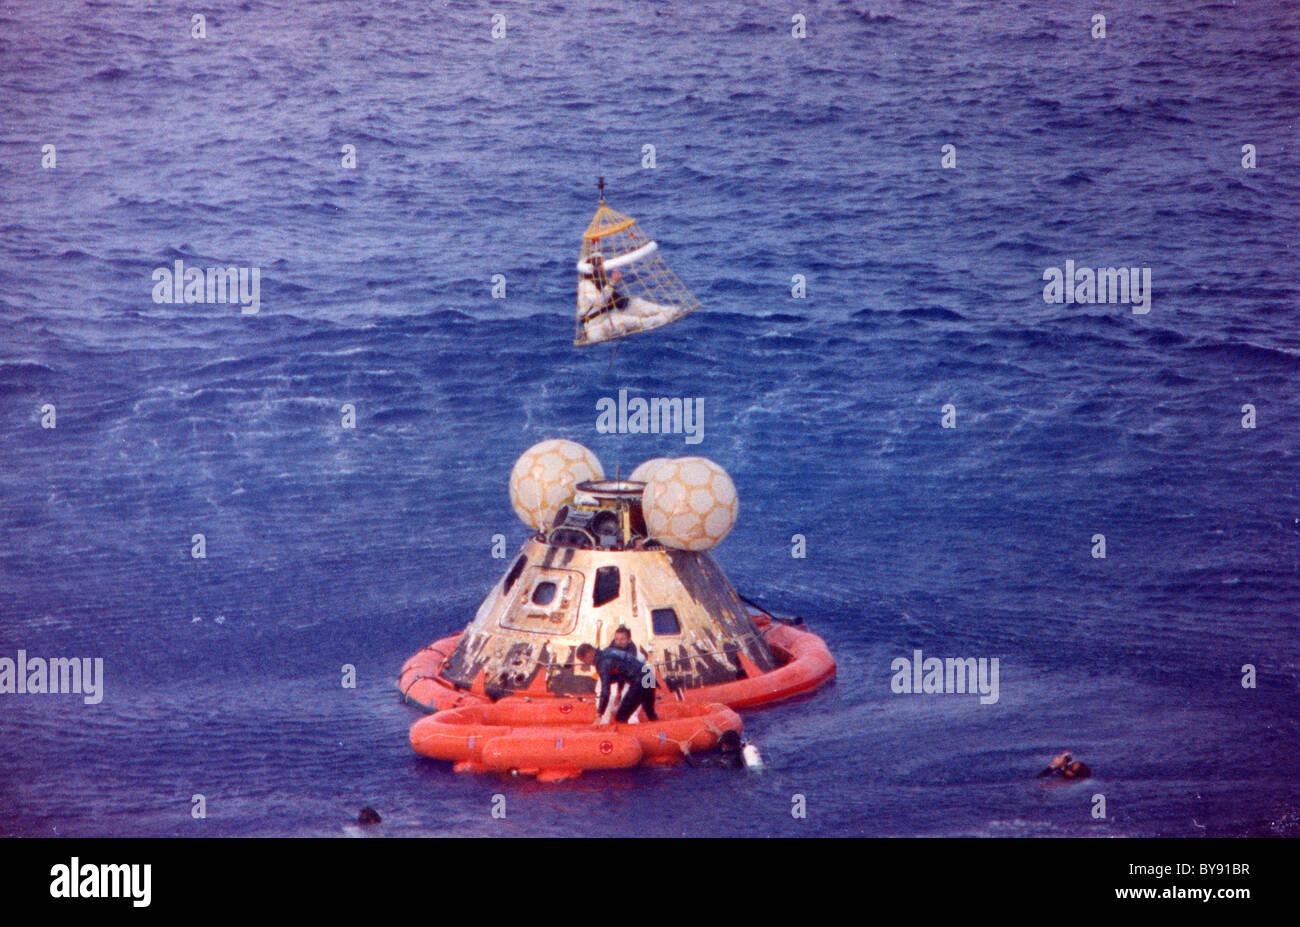 Apollo 13 Recovery - Stock Image